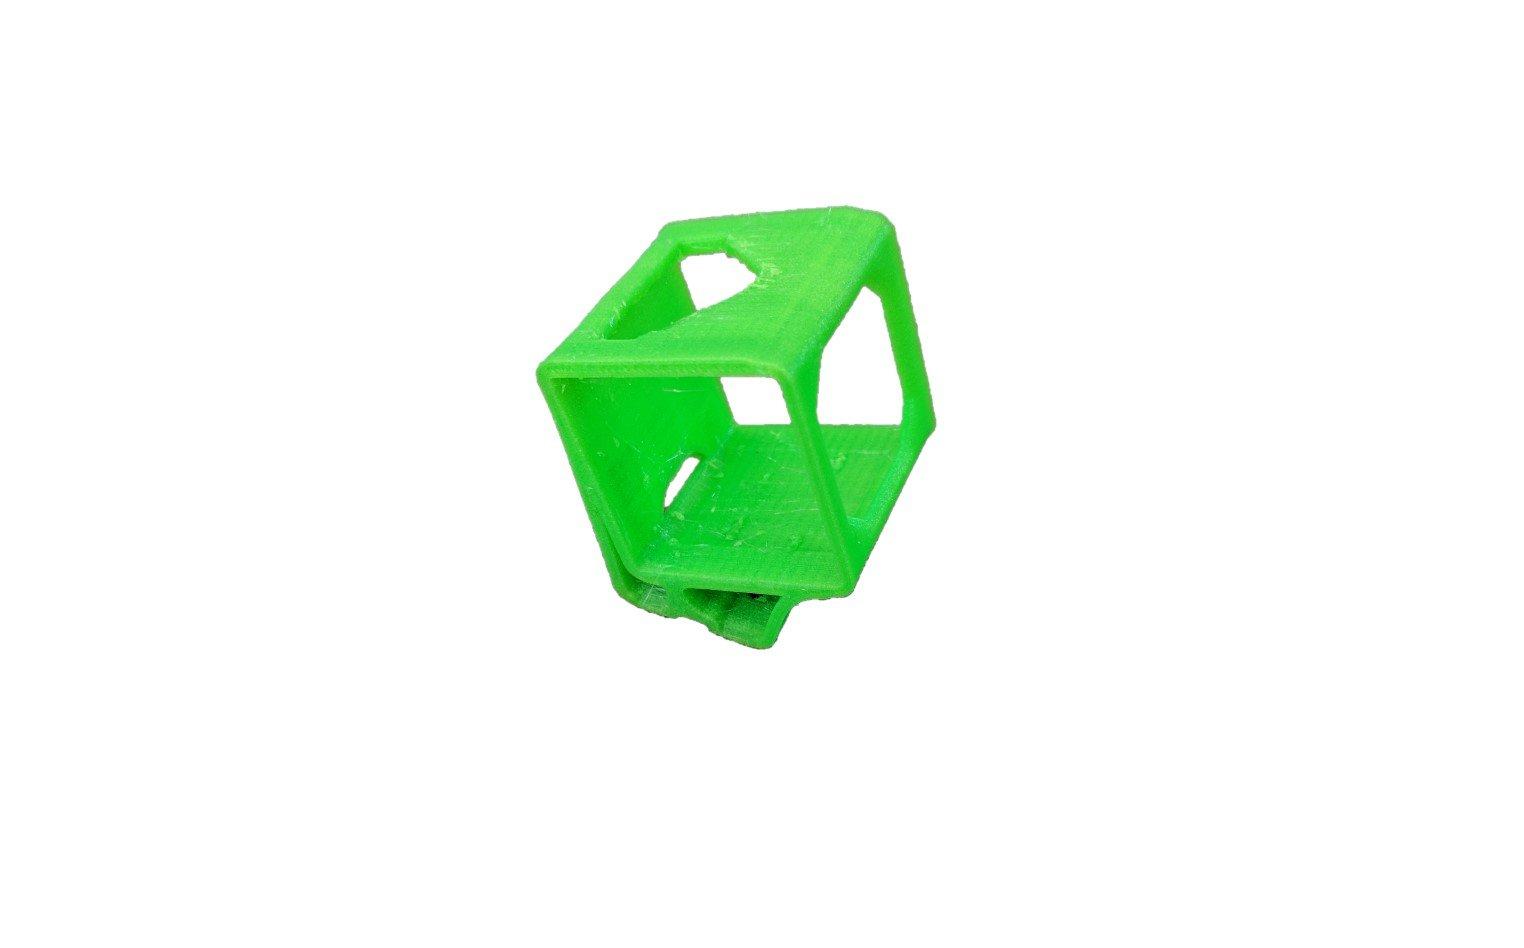 3D FPV Prints Gorpo Session Quadcopter Mount 4 Angles 2 Colors 3D Printed TPU Flexible